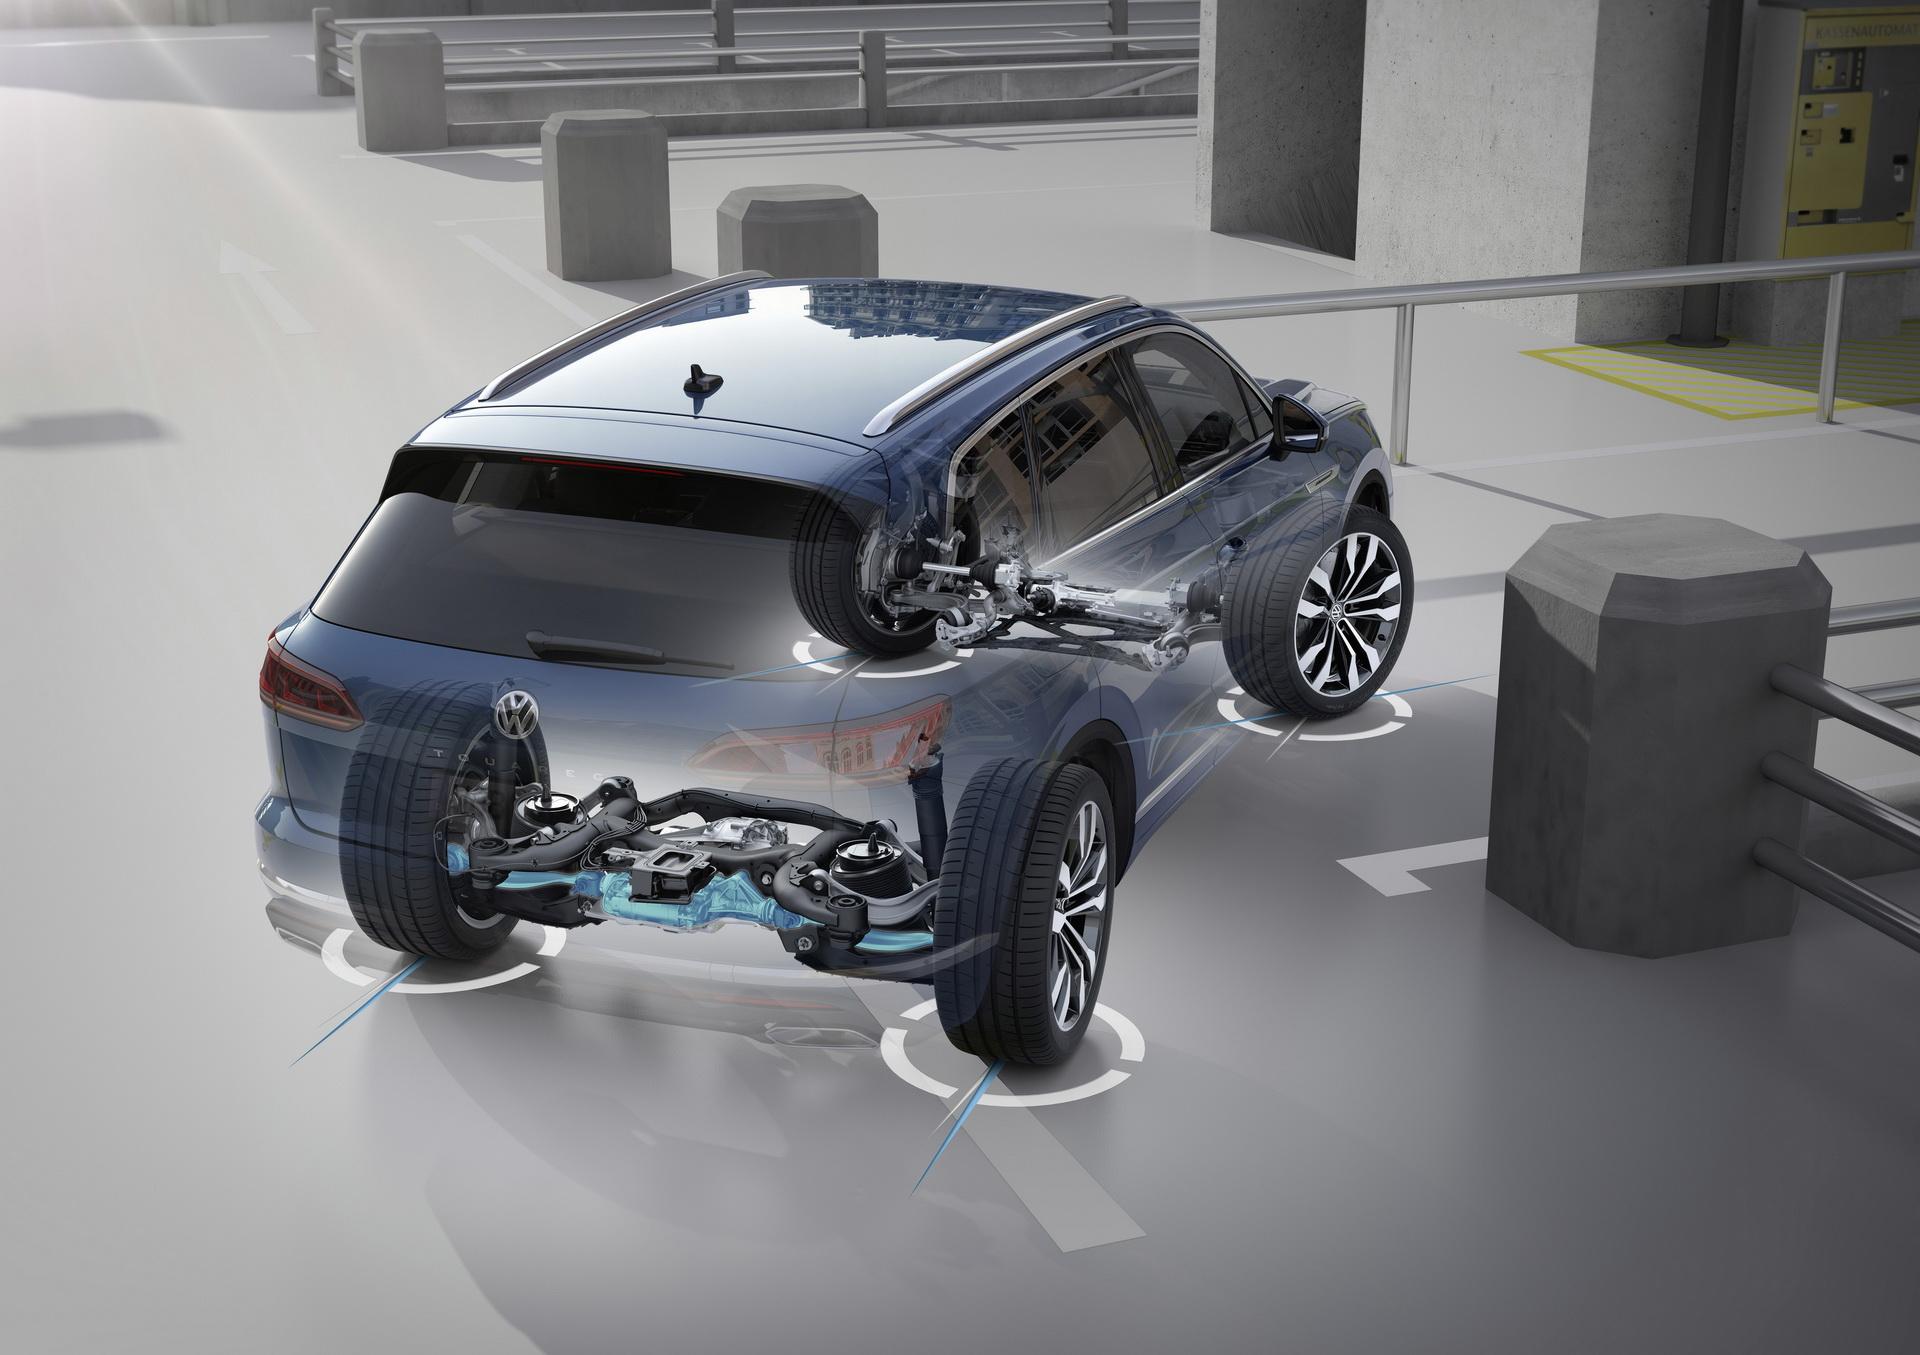 Volkswagen Touareg 2018 (34)